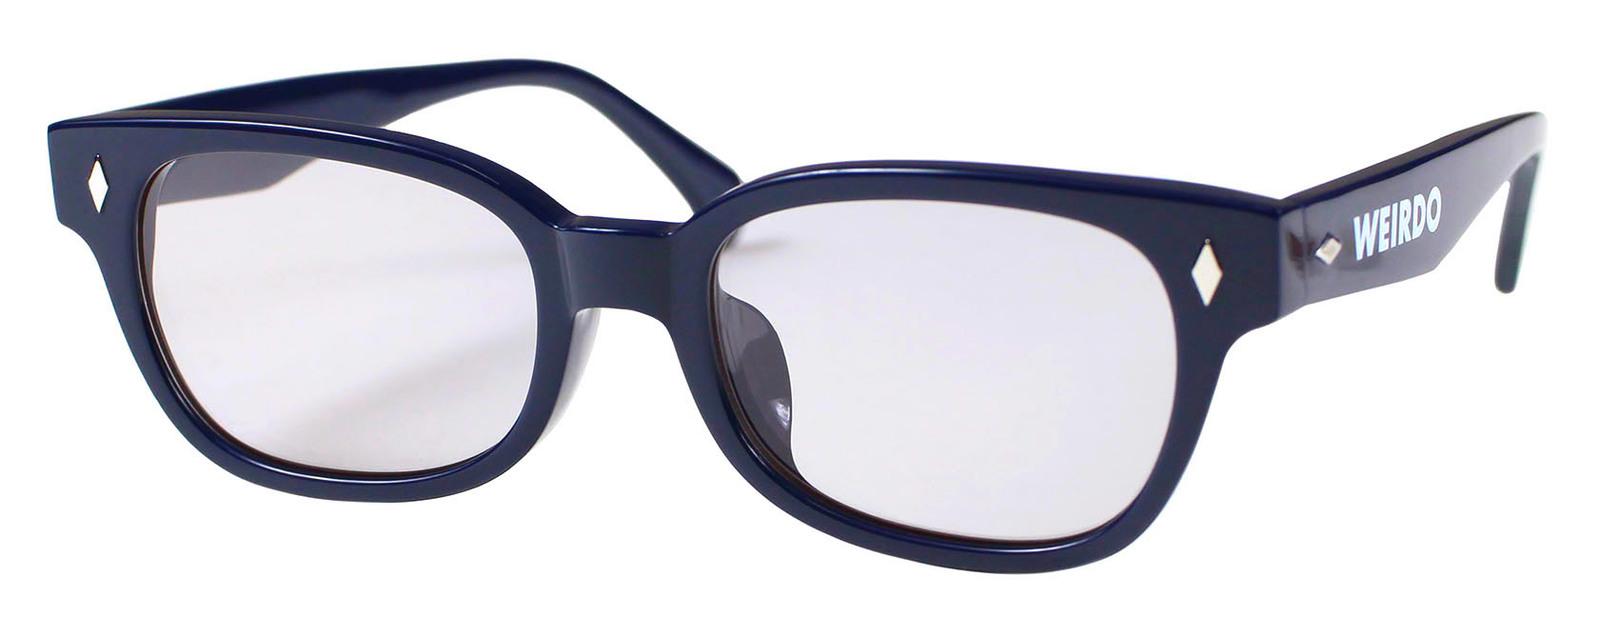 0eb5dcac783c ウィアード 小物 メンズ レディース サングラス WEIRDO [-FREAKY RIDERS - GLASSES- NAVY×GRAY